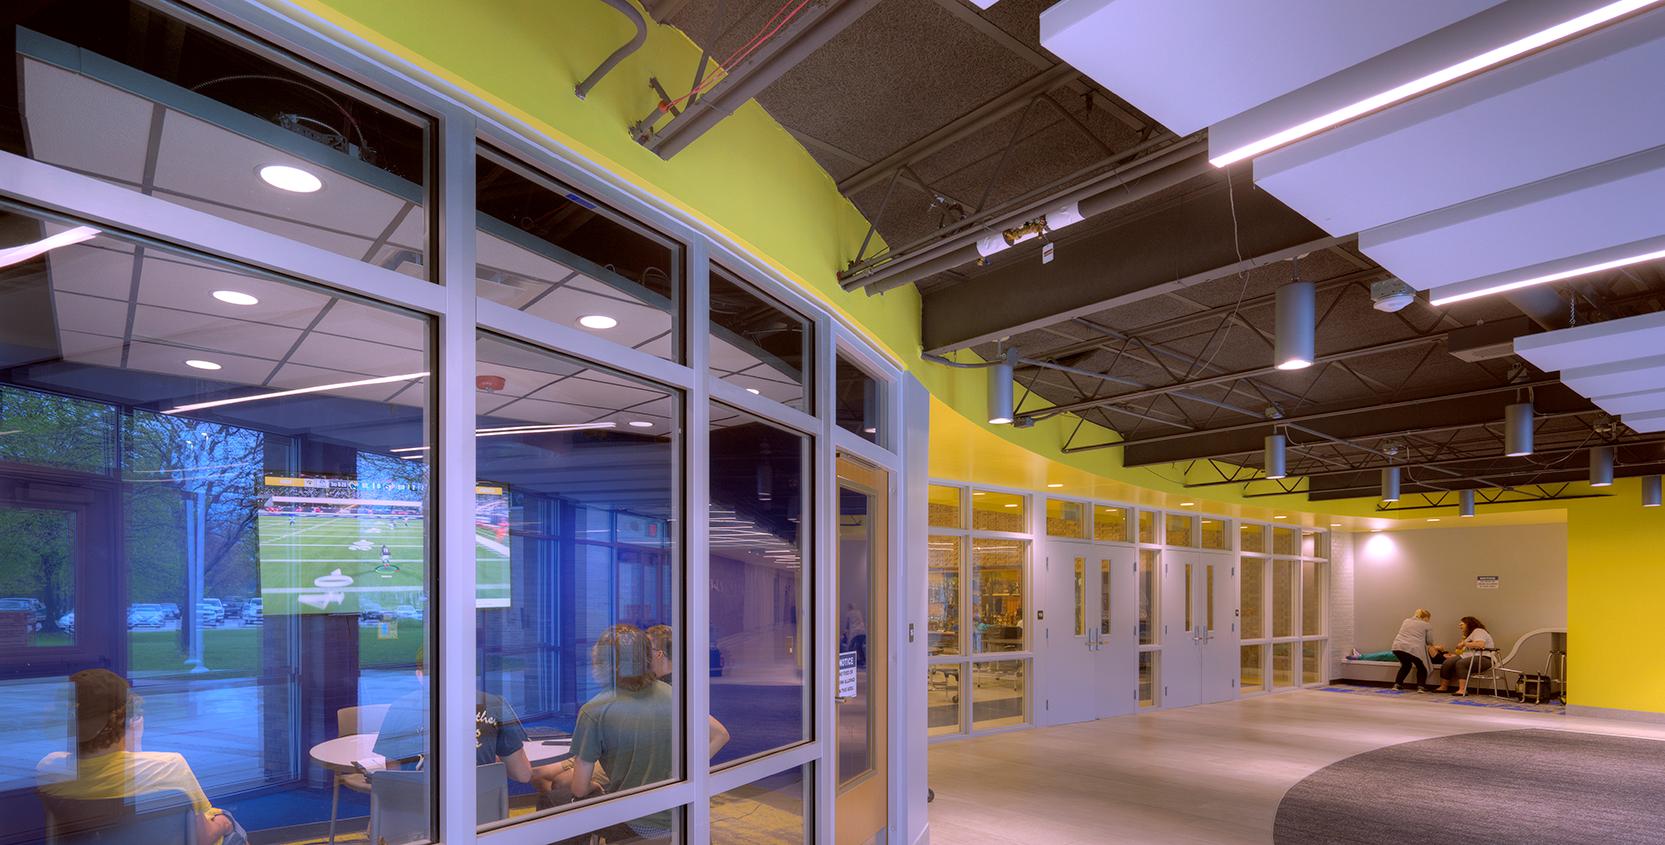 Port-Huron-Northern-High-School-Renovation-Classroom-Corridor-2-1665x845